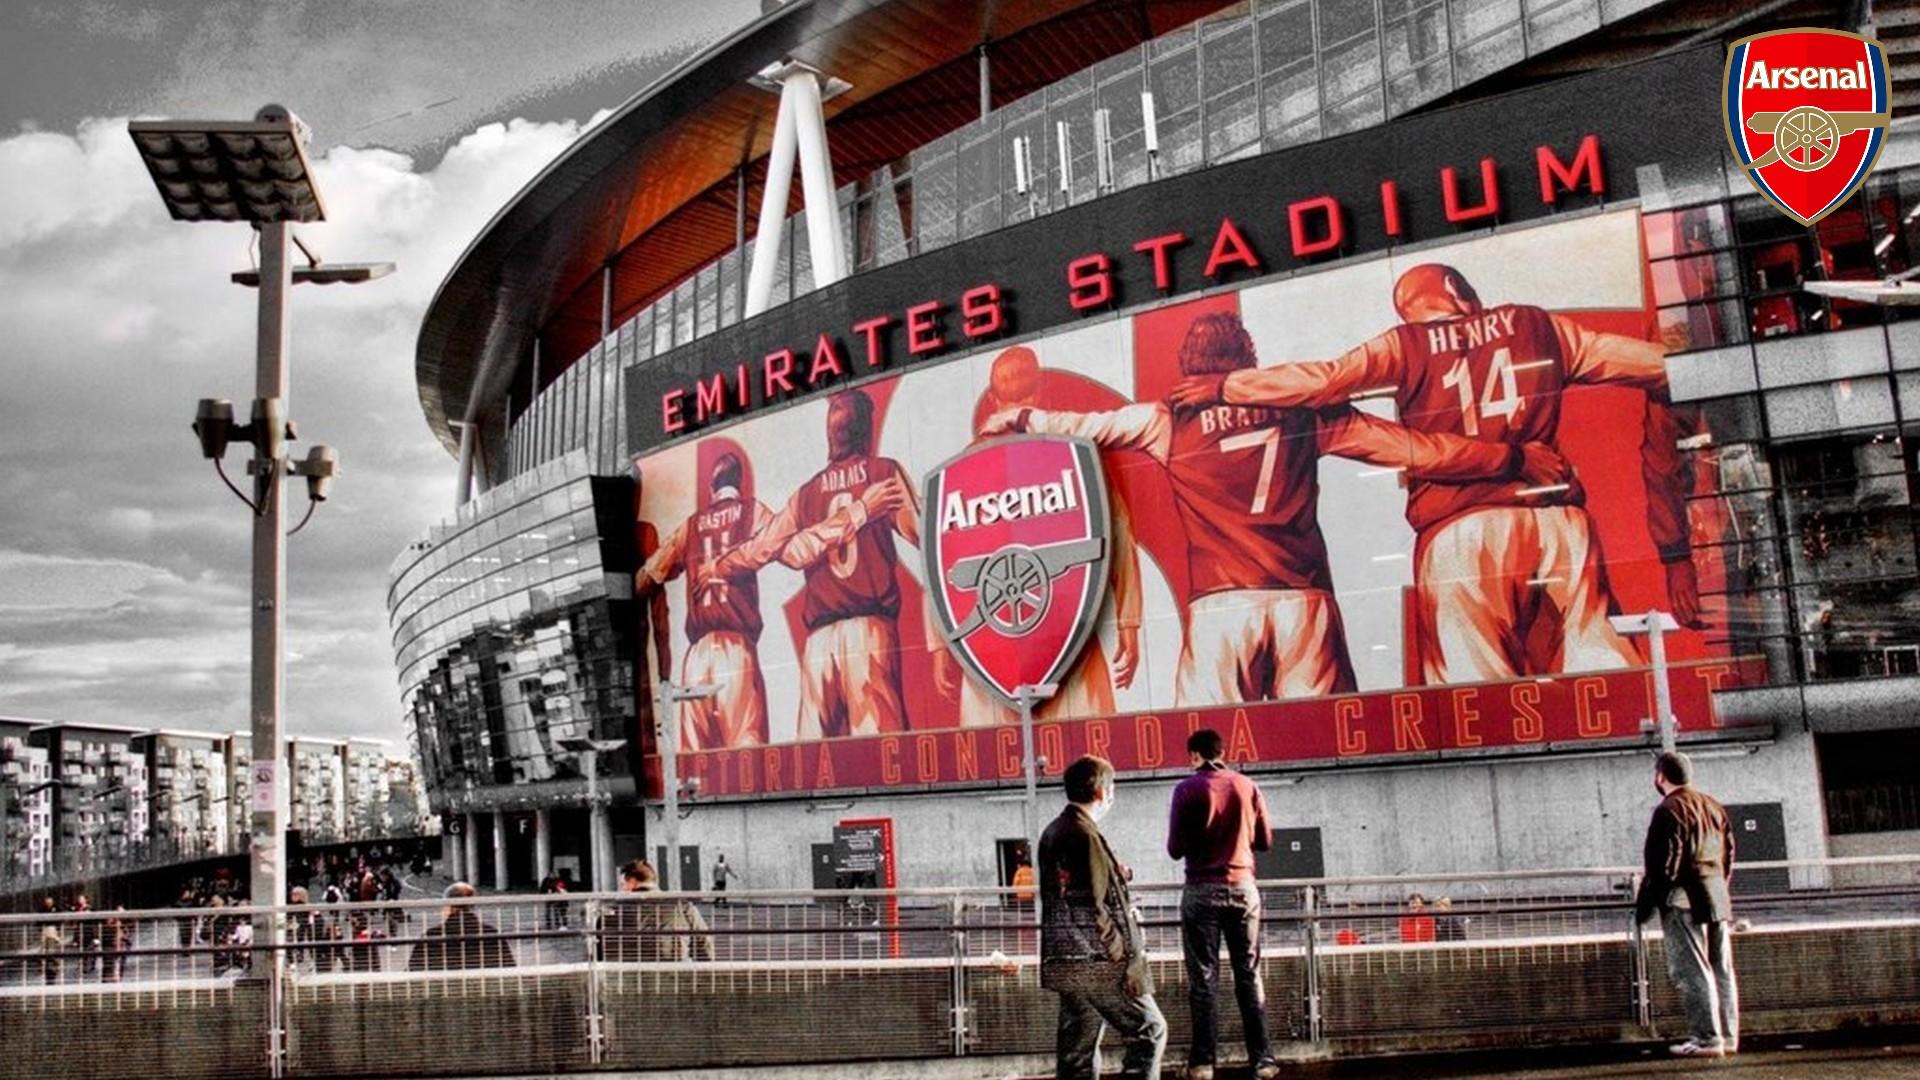 arsenal stadium hd wallpapers 2021